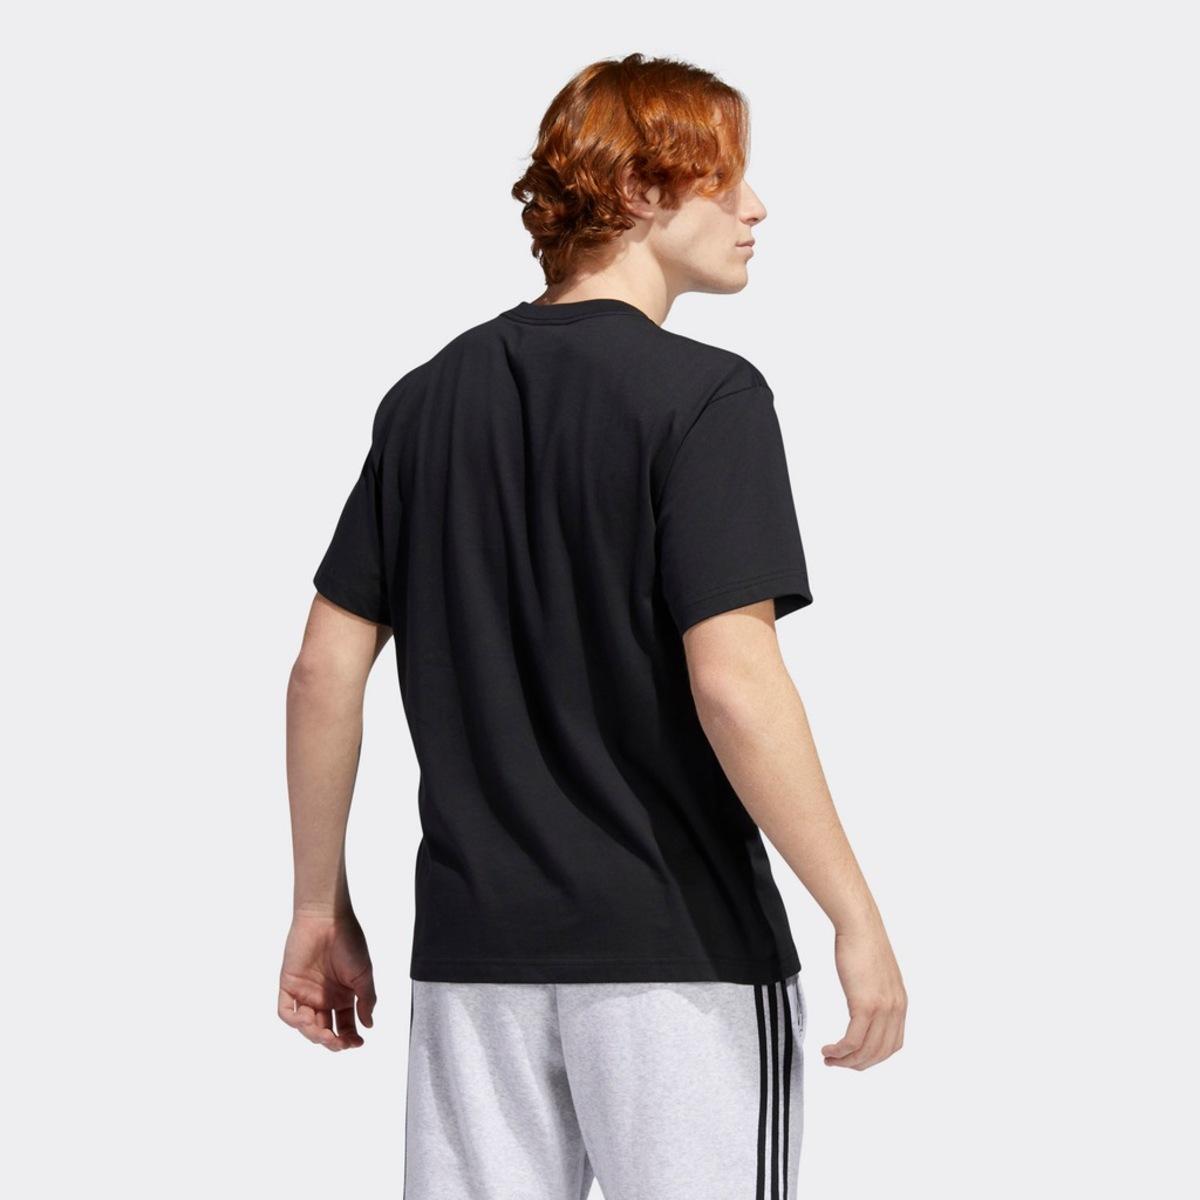 Internat Erkek Siyah Spor Tişört